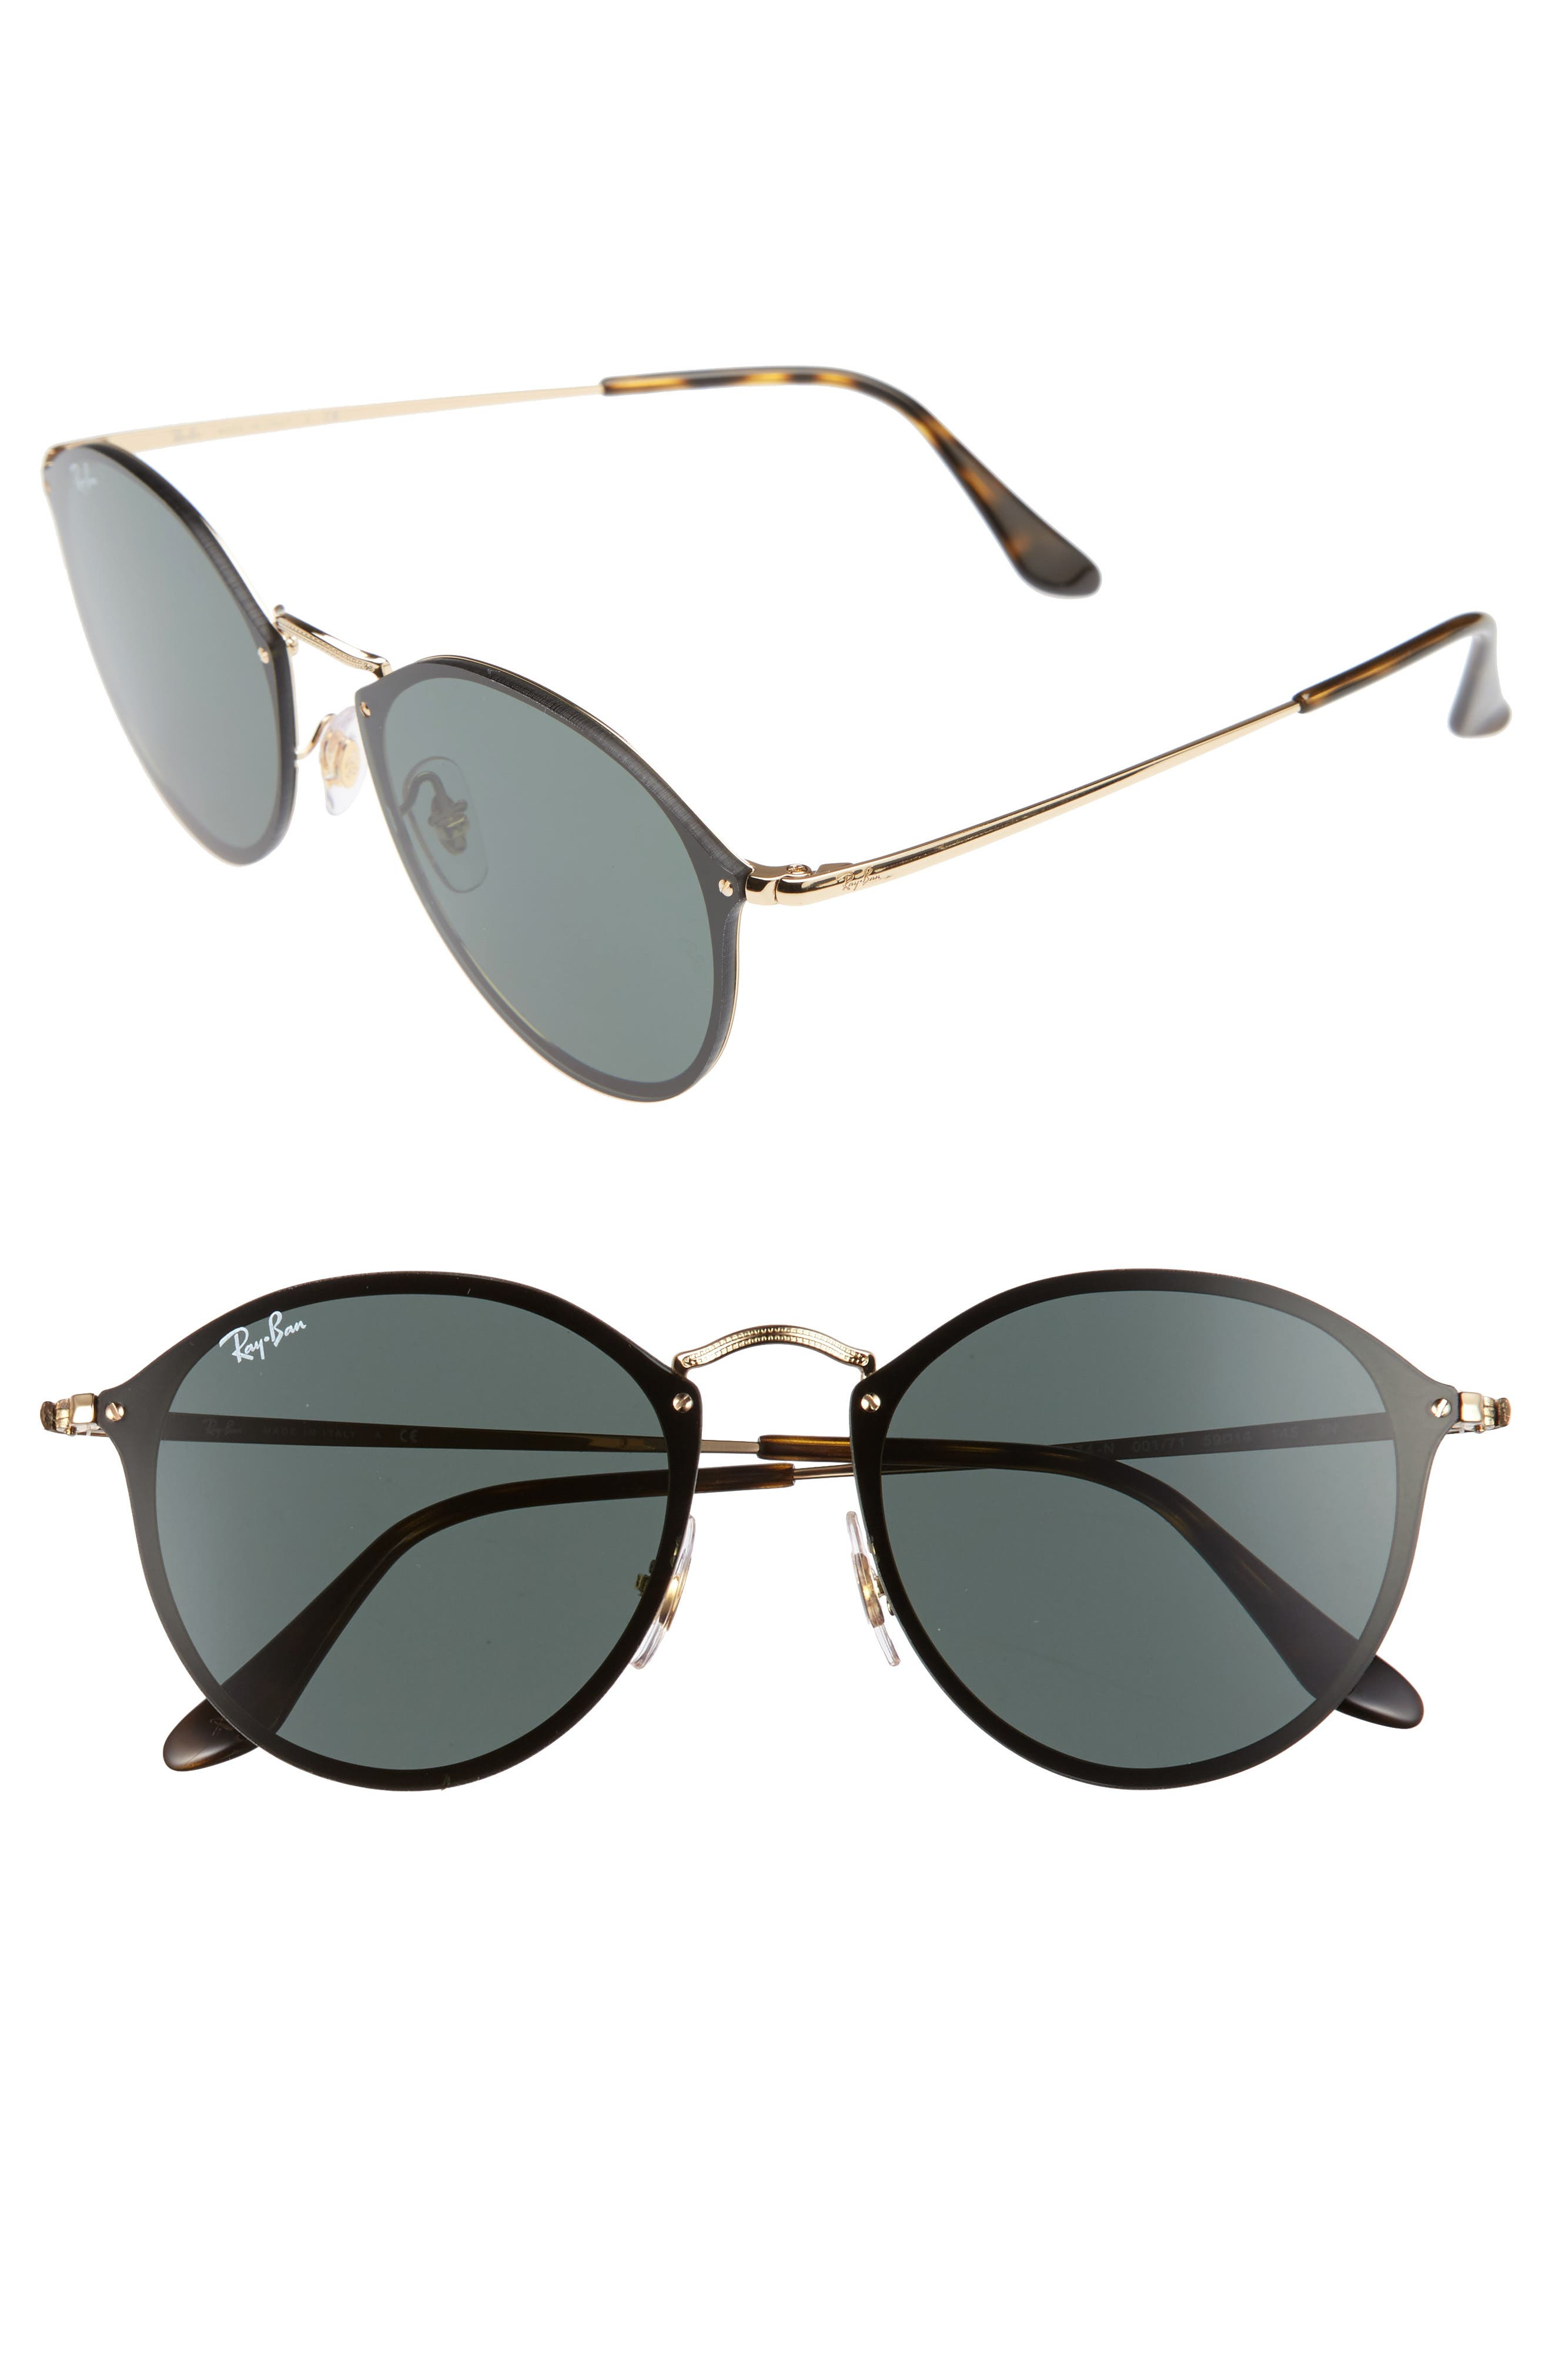 Main Image - Ray-Ban Blaze 59mm Round Sunglasses